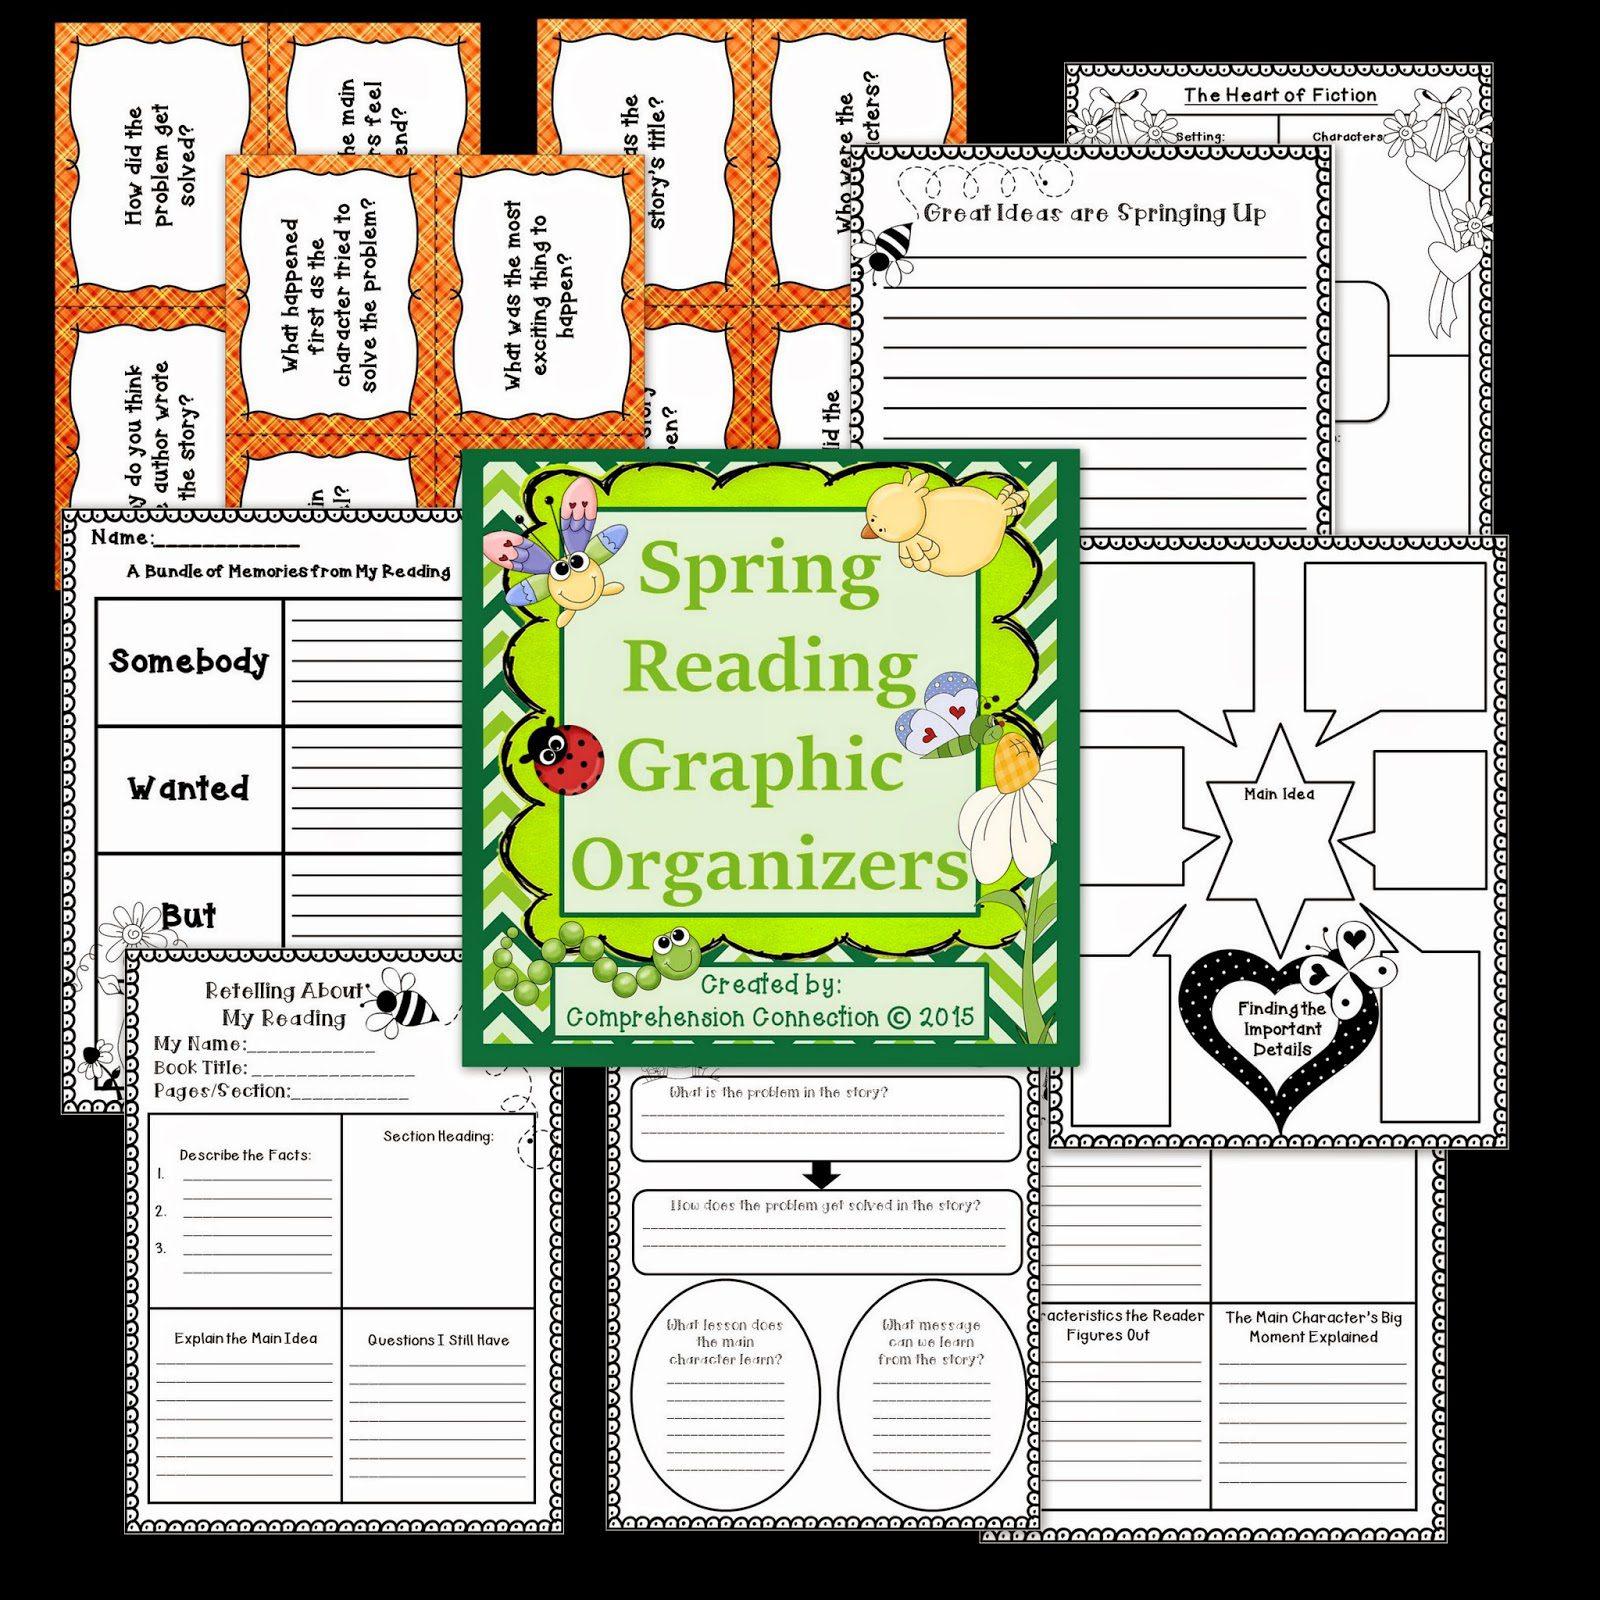 spring2bgraphic2borganizers-8518747